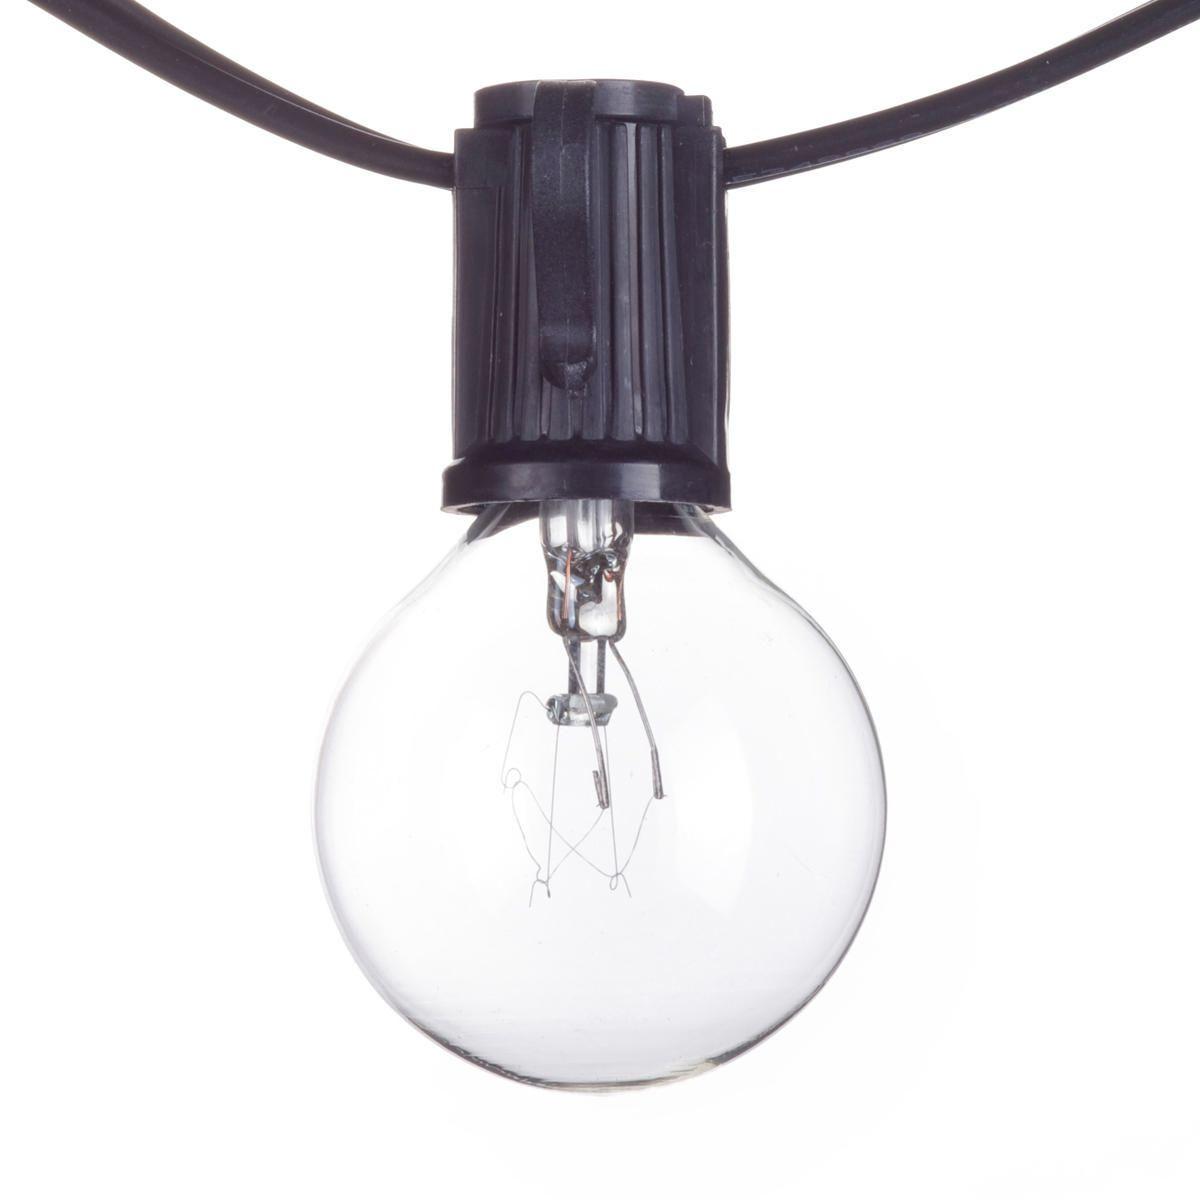 Monaco 25ft Indoor Outdoor Plug In String Light Black Cord M F Plugs Bulbs Included Walmart Canada